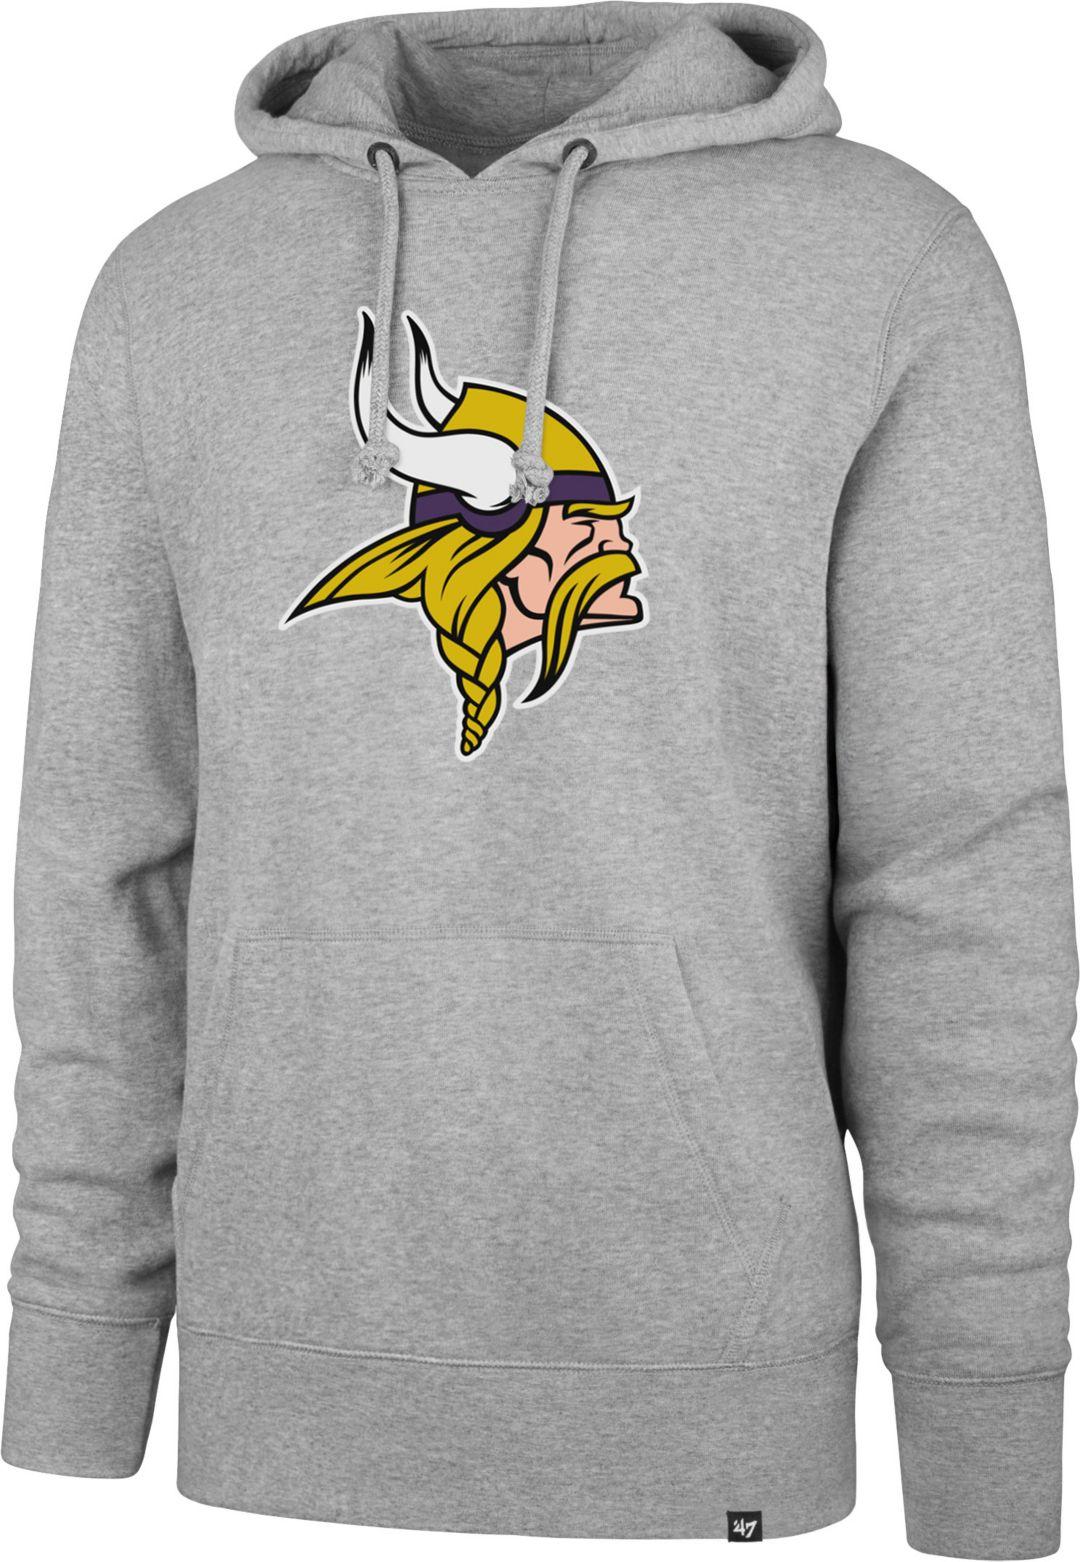 online store 0694c 5e07e '47 Men's Minnesota Vikings Headline Grey Hoodie